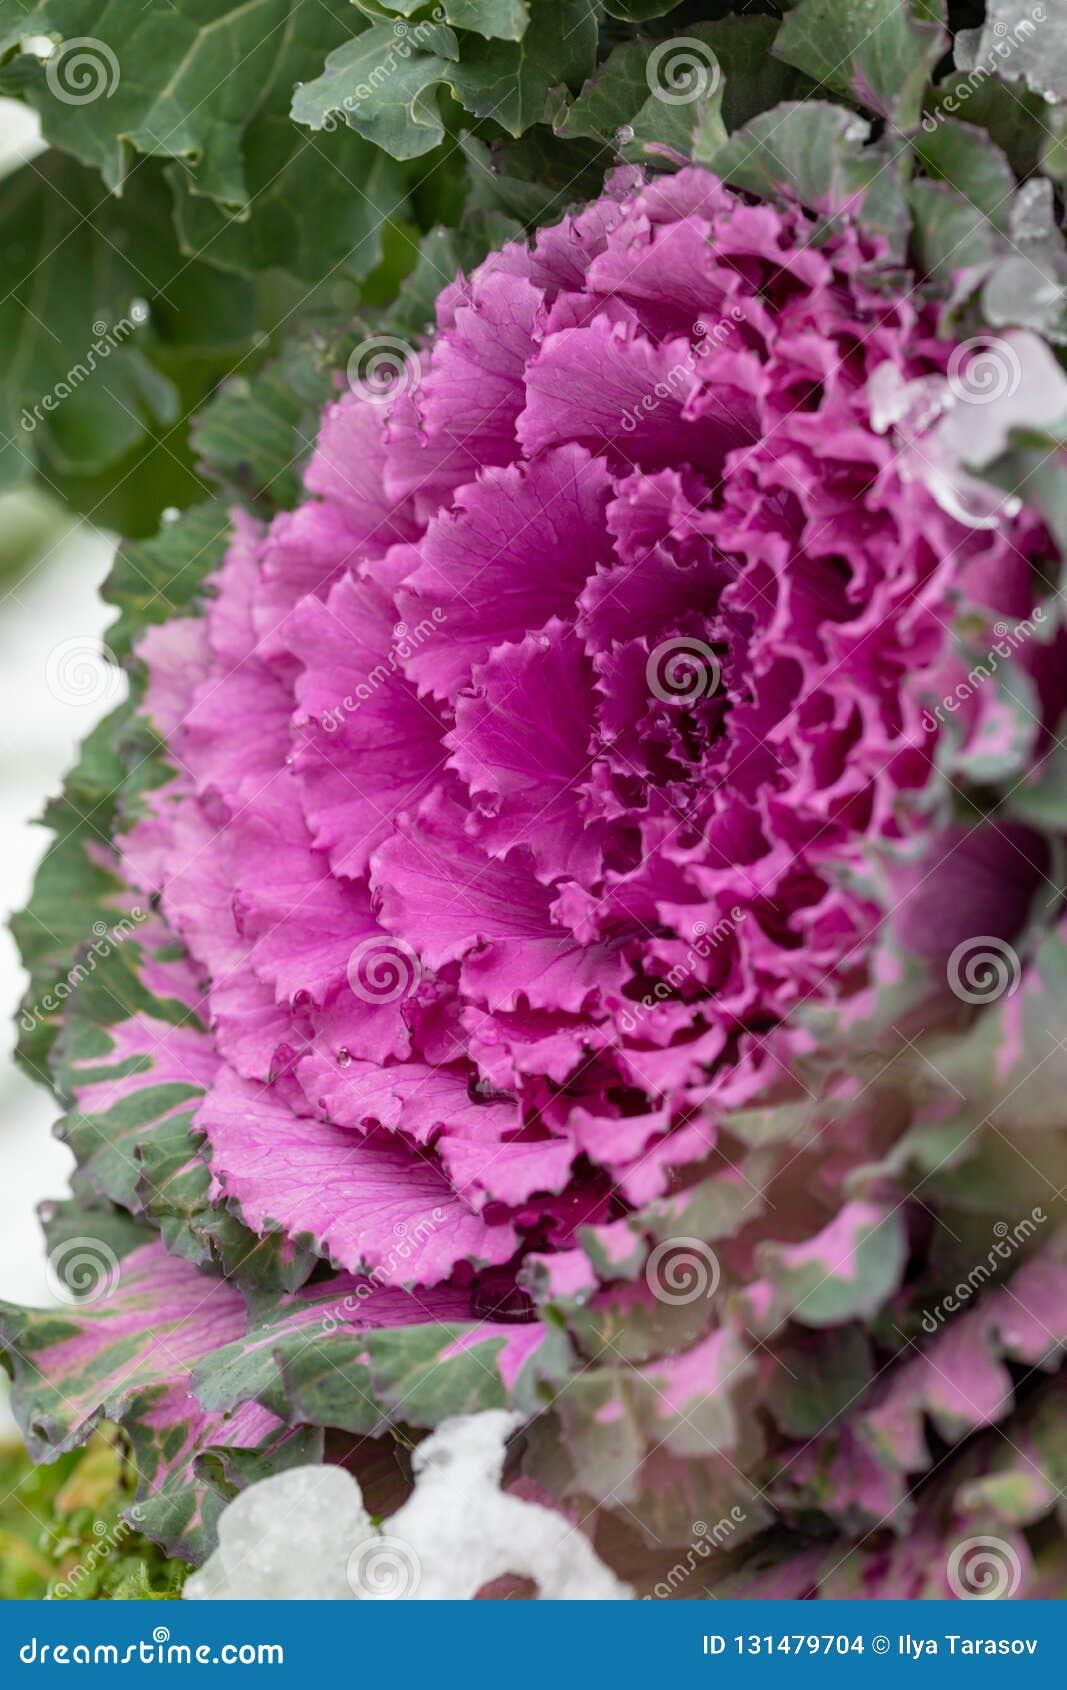 Flowering Decorative Purple Pink Cabbage Plant Ornamental Kale